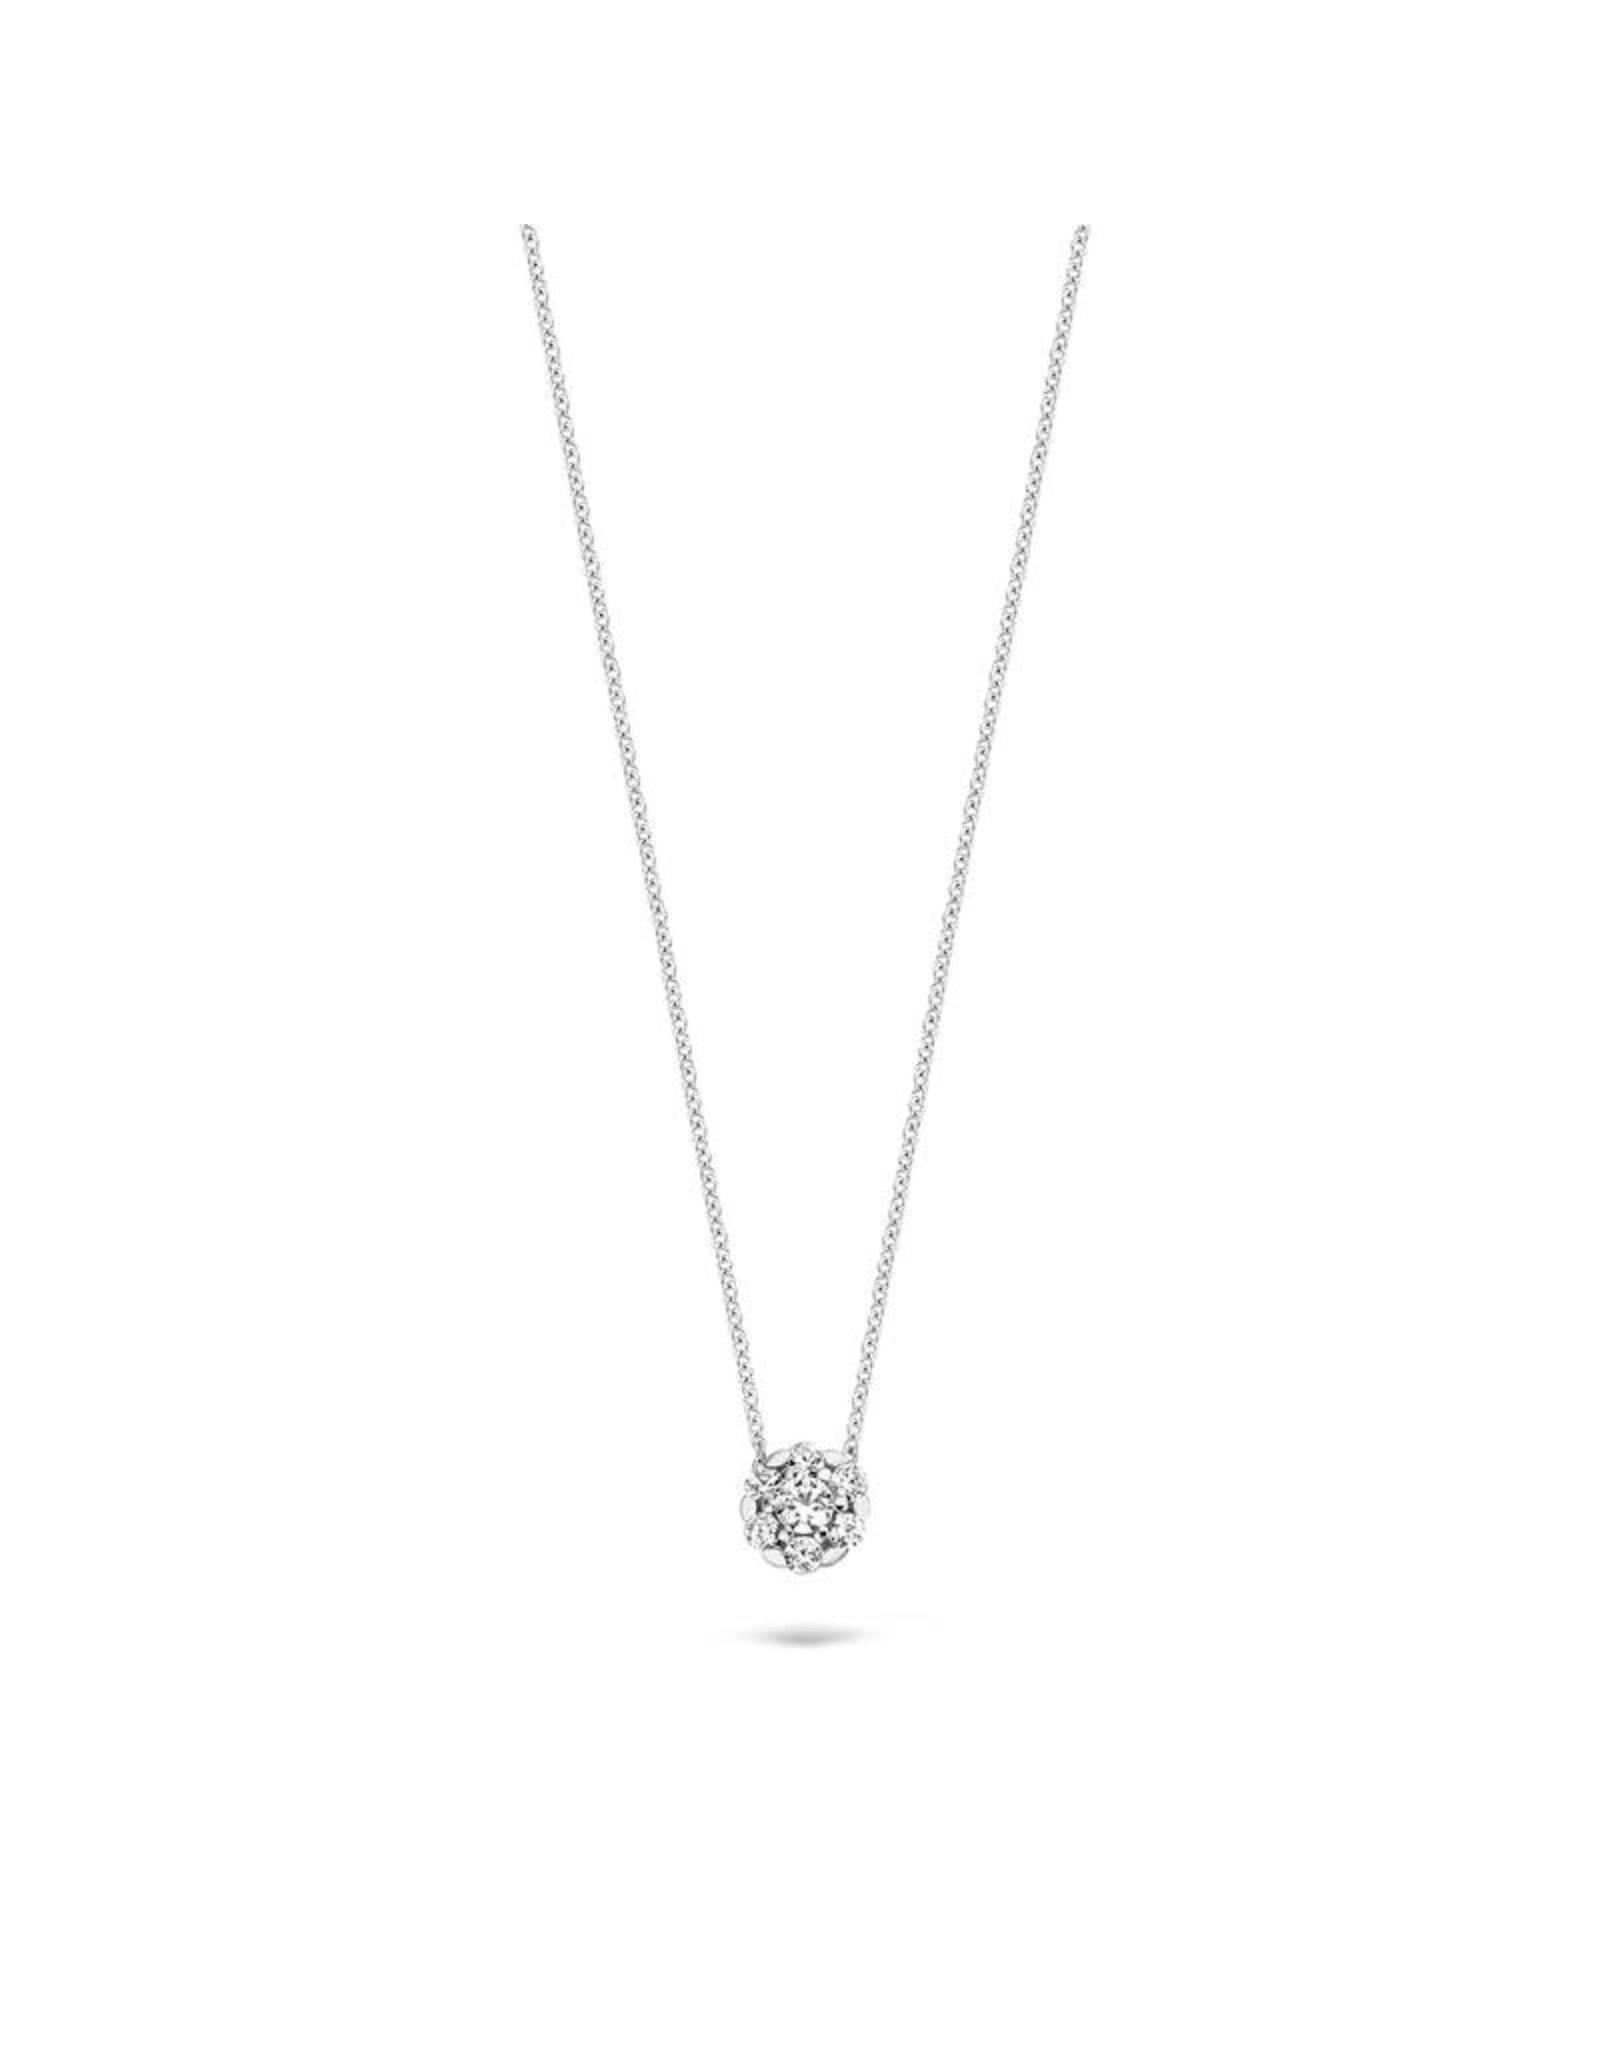 Blush Halsketting Wit goud 14kt 3097WZI Zirconium